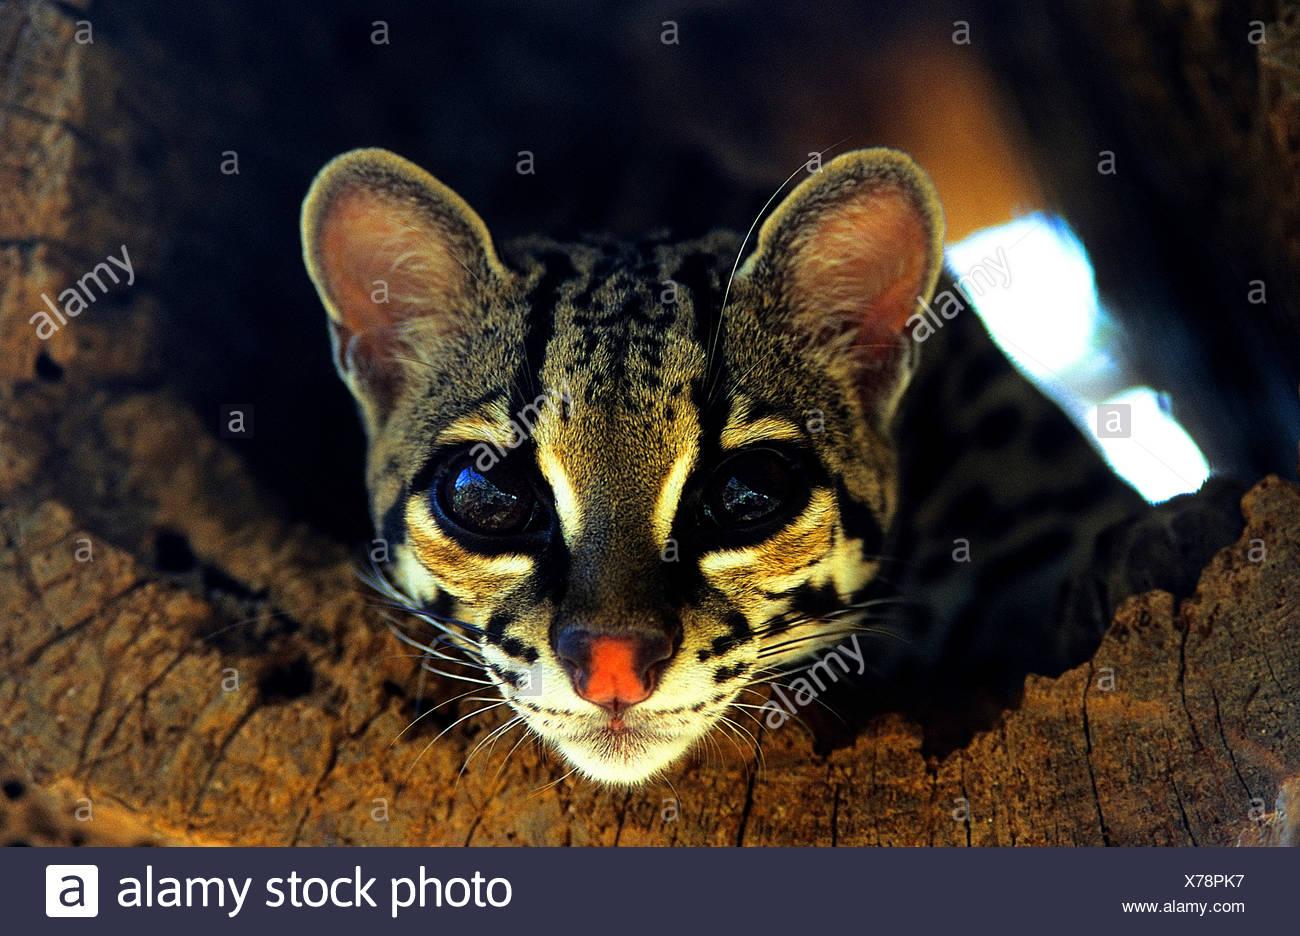 Langschanzkatze, Langschwanz-Katze, Peludo, Margay, Bergozelot, Berg-Ozelot, Baumozelot, Baum-Ozelot (Leopardus wiedii), Portrae - Stock Image